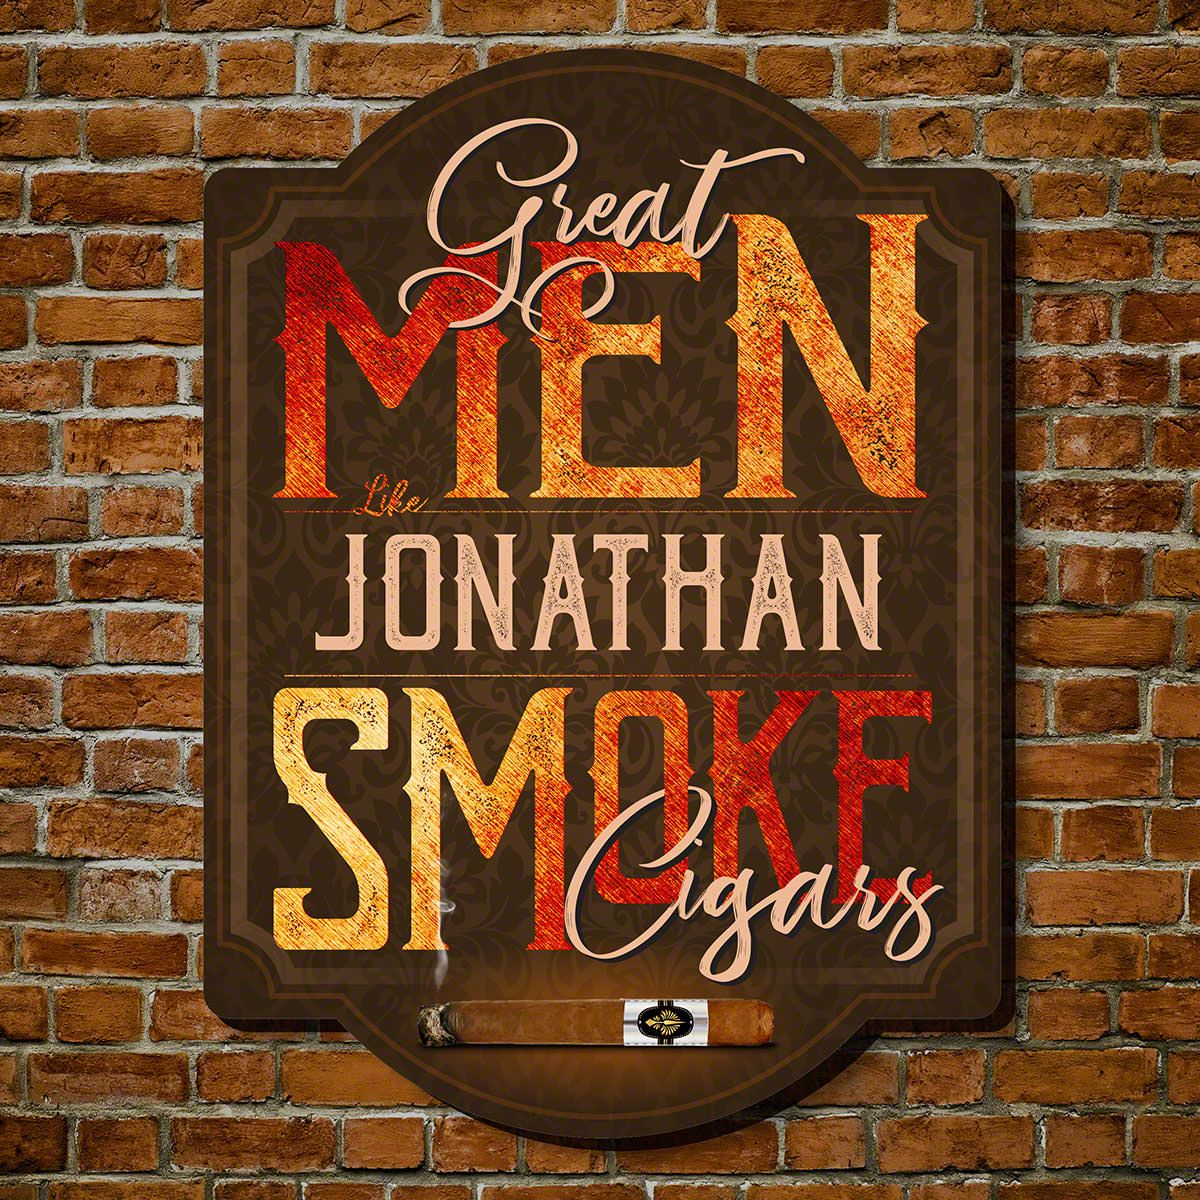 Axton Great Men Smoke Cigars Custom Wooden Sign